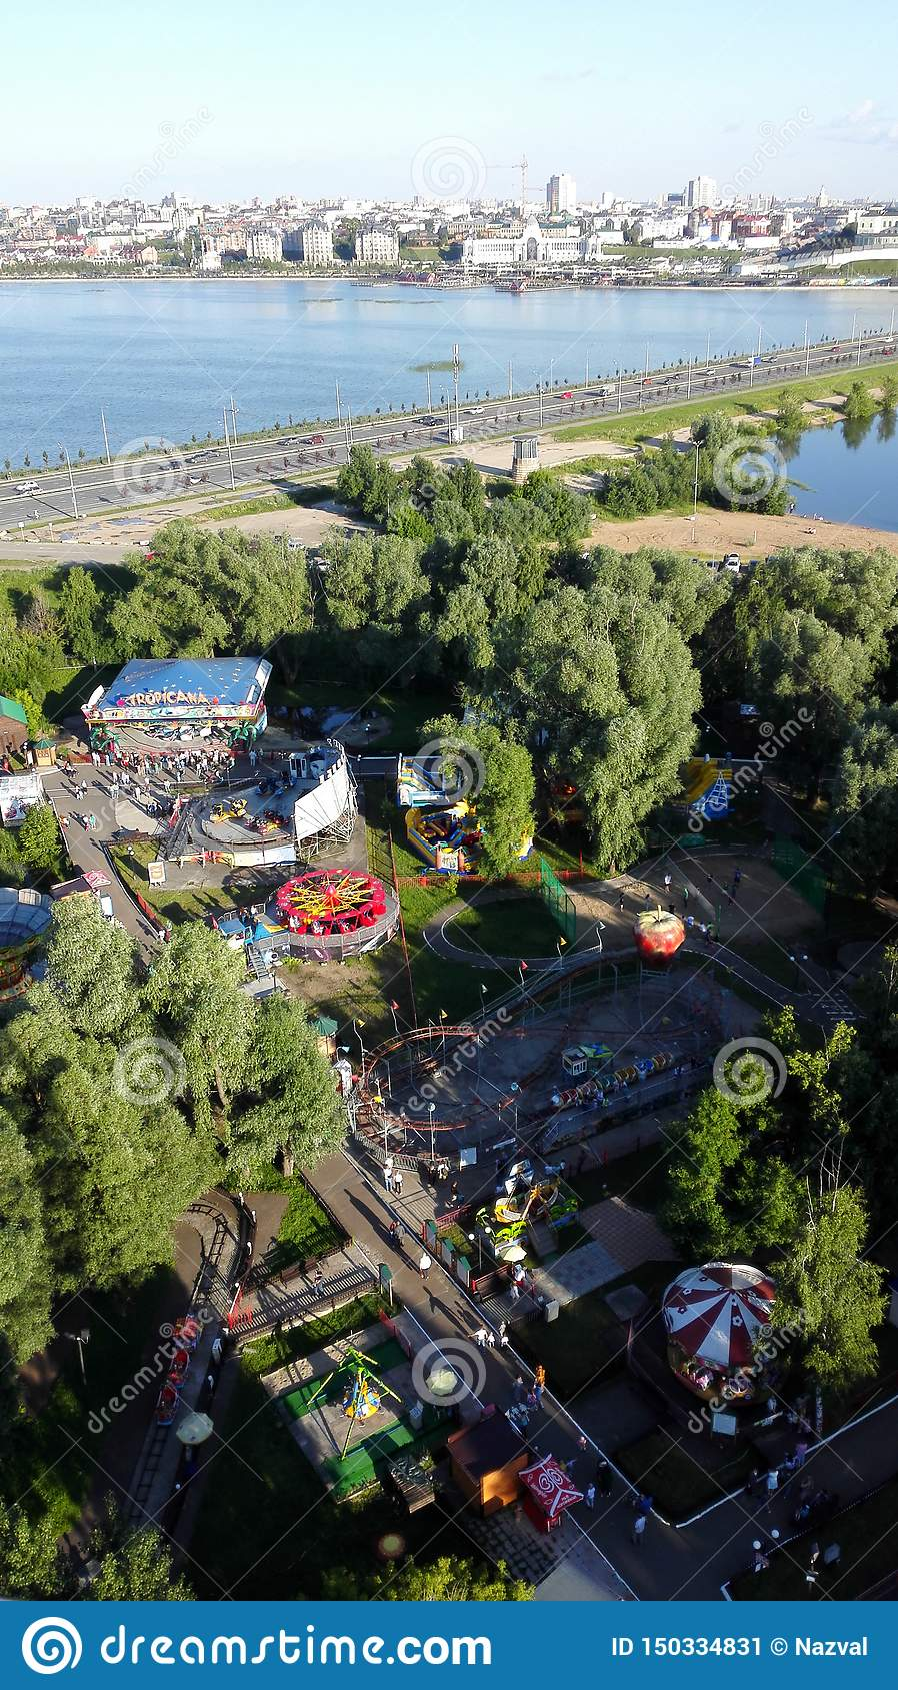 Bella vista panoramica del parco di divertimenti a Kazan